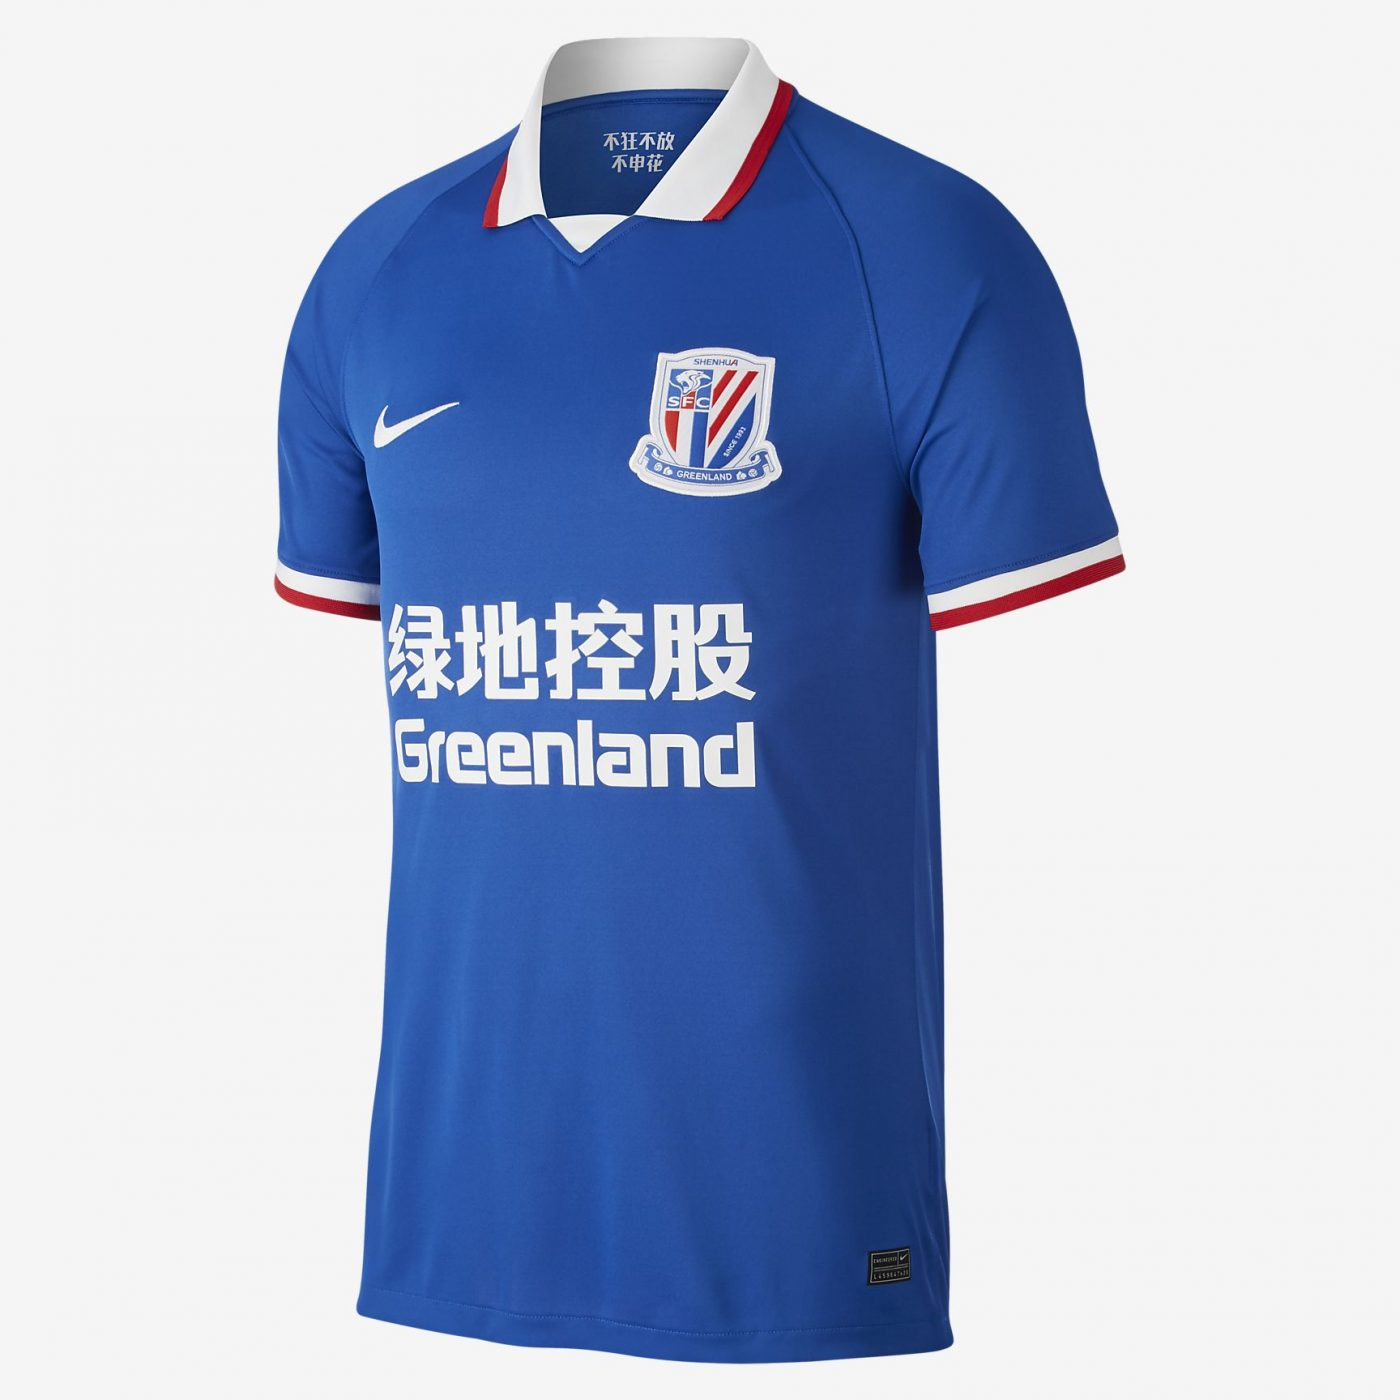 maillot-de-football-shanghai-greenland-shenhua-fc-2020